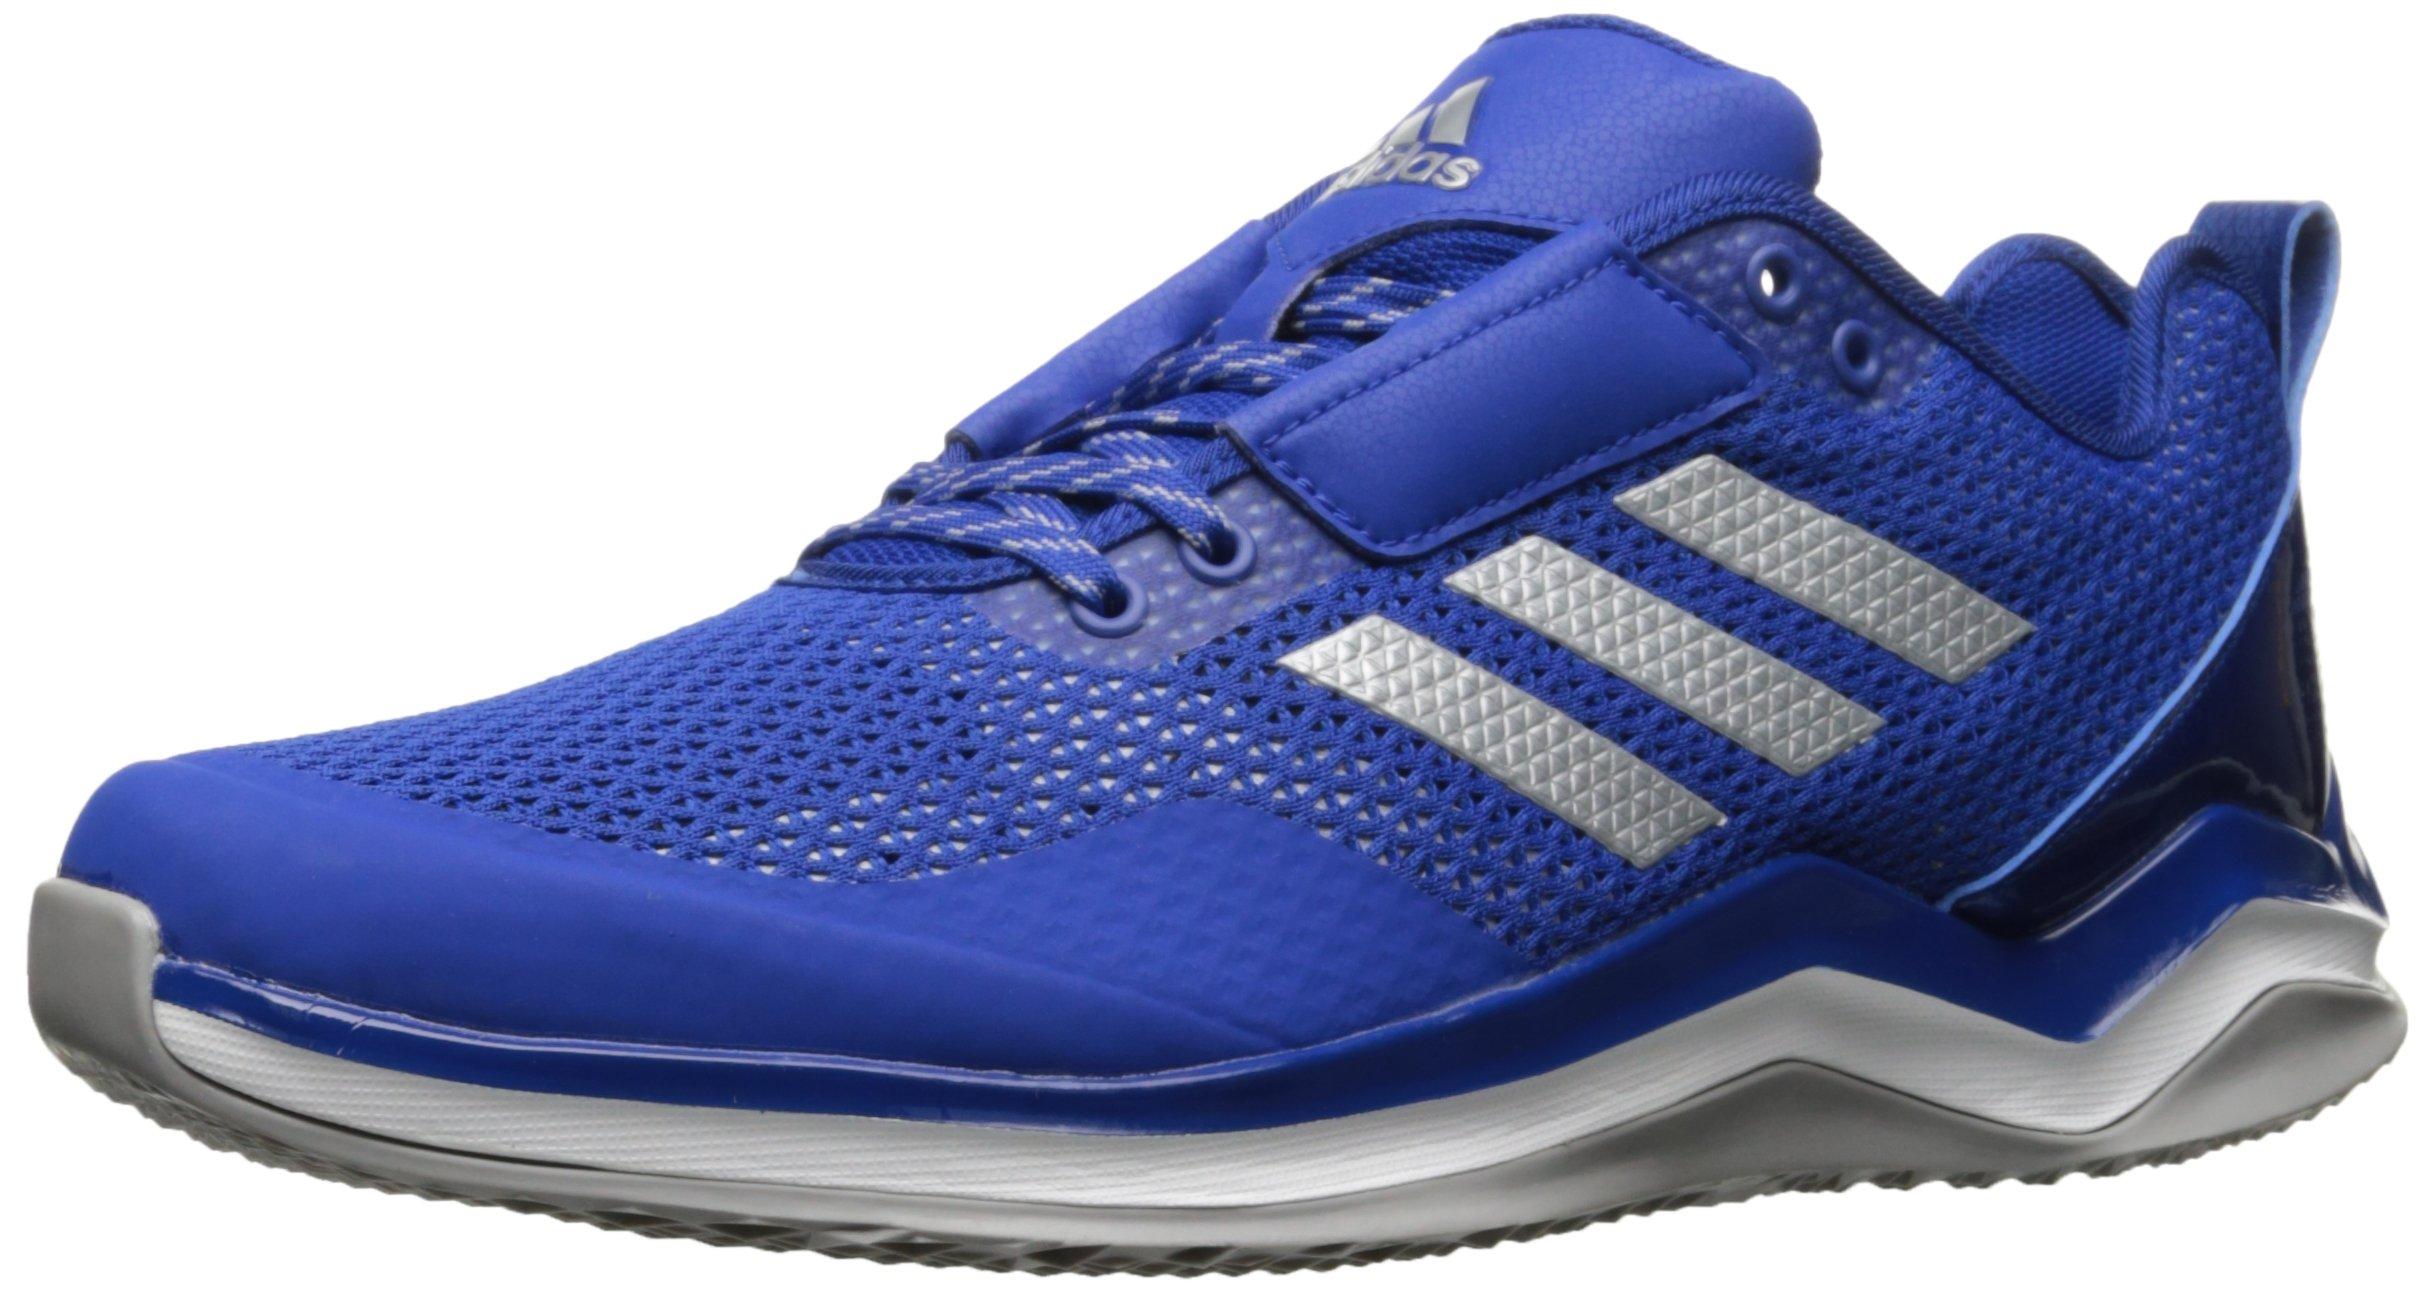 adidas Performance Men's Speed Trainer 3.0, Collegiate Royal/Metallic Silver/White, 11 M US